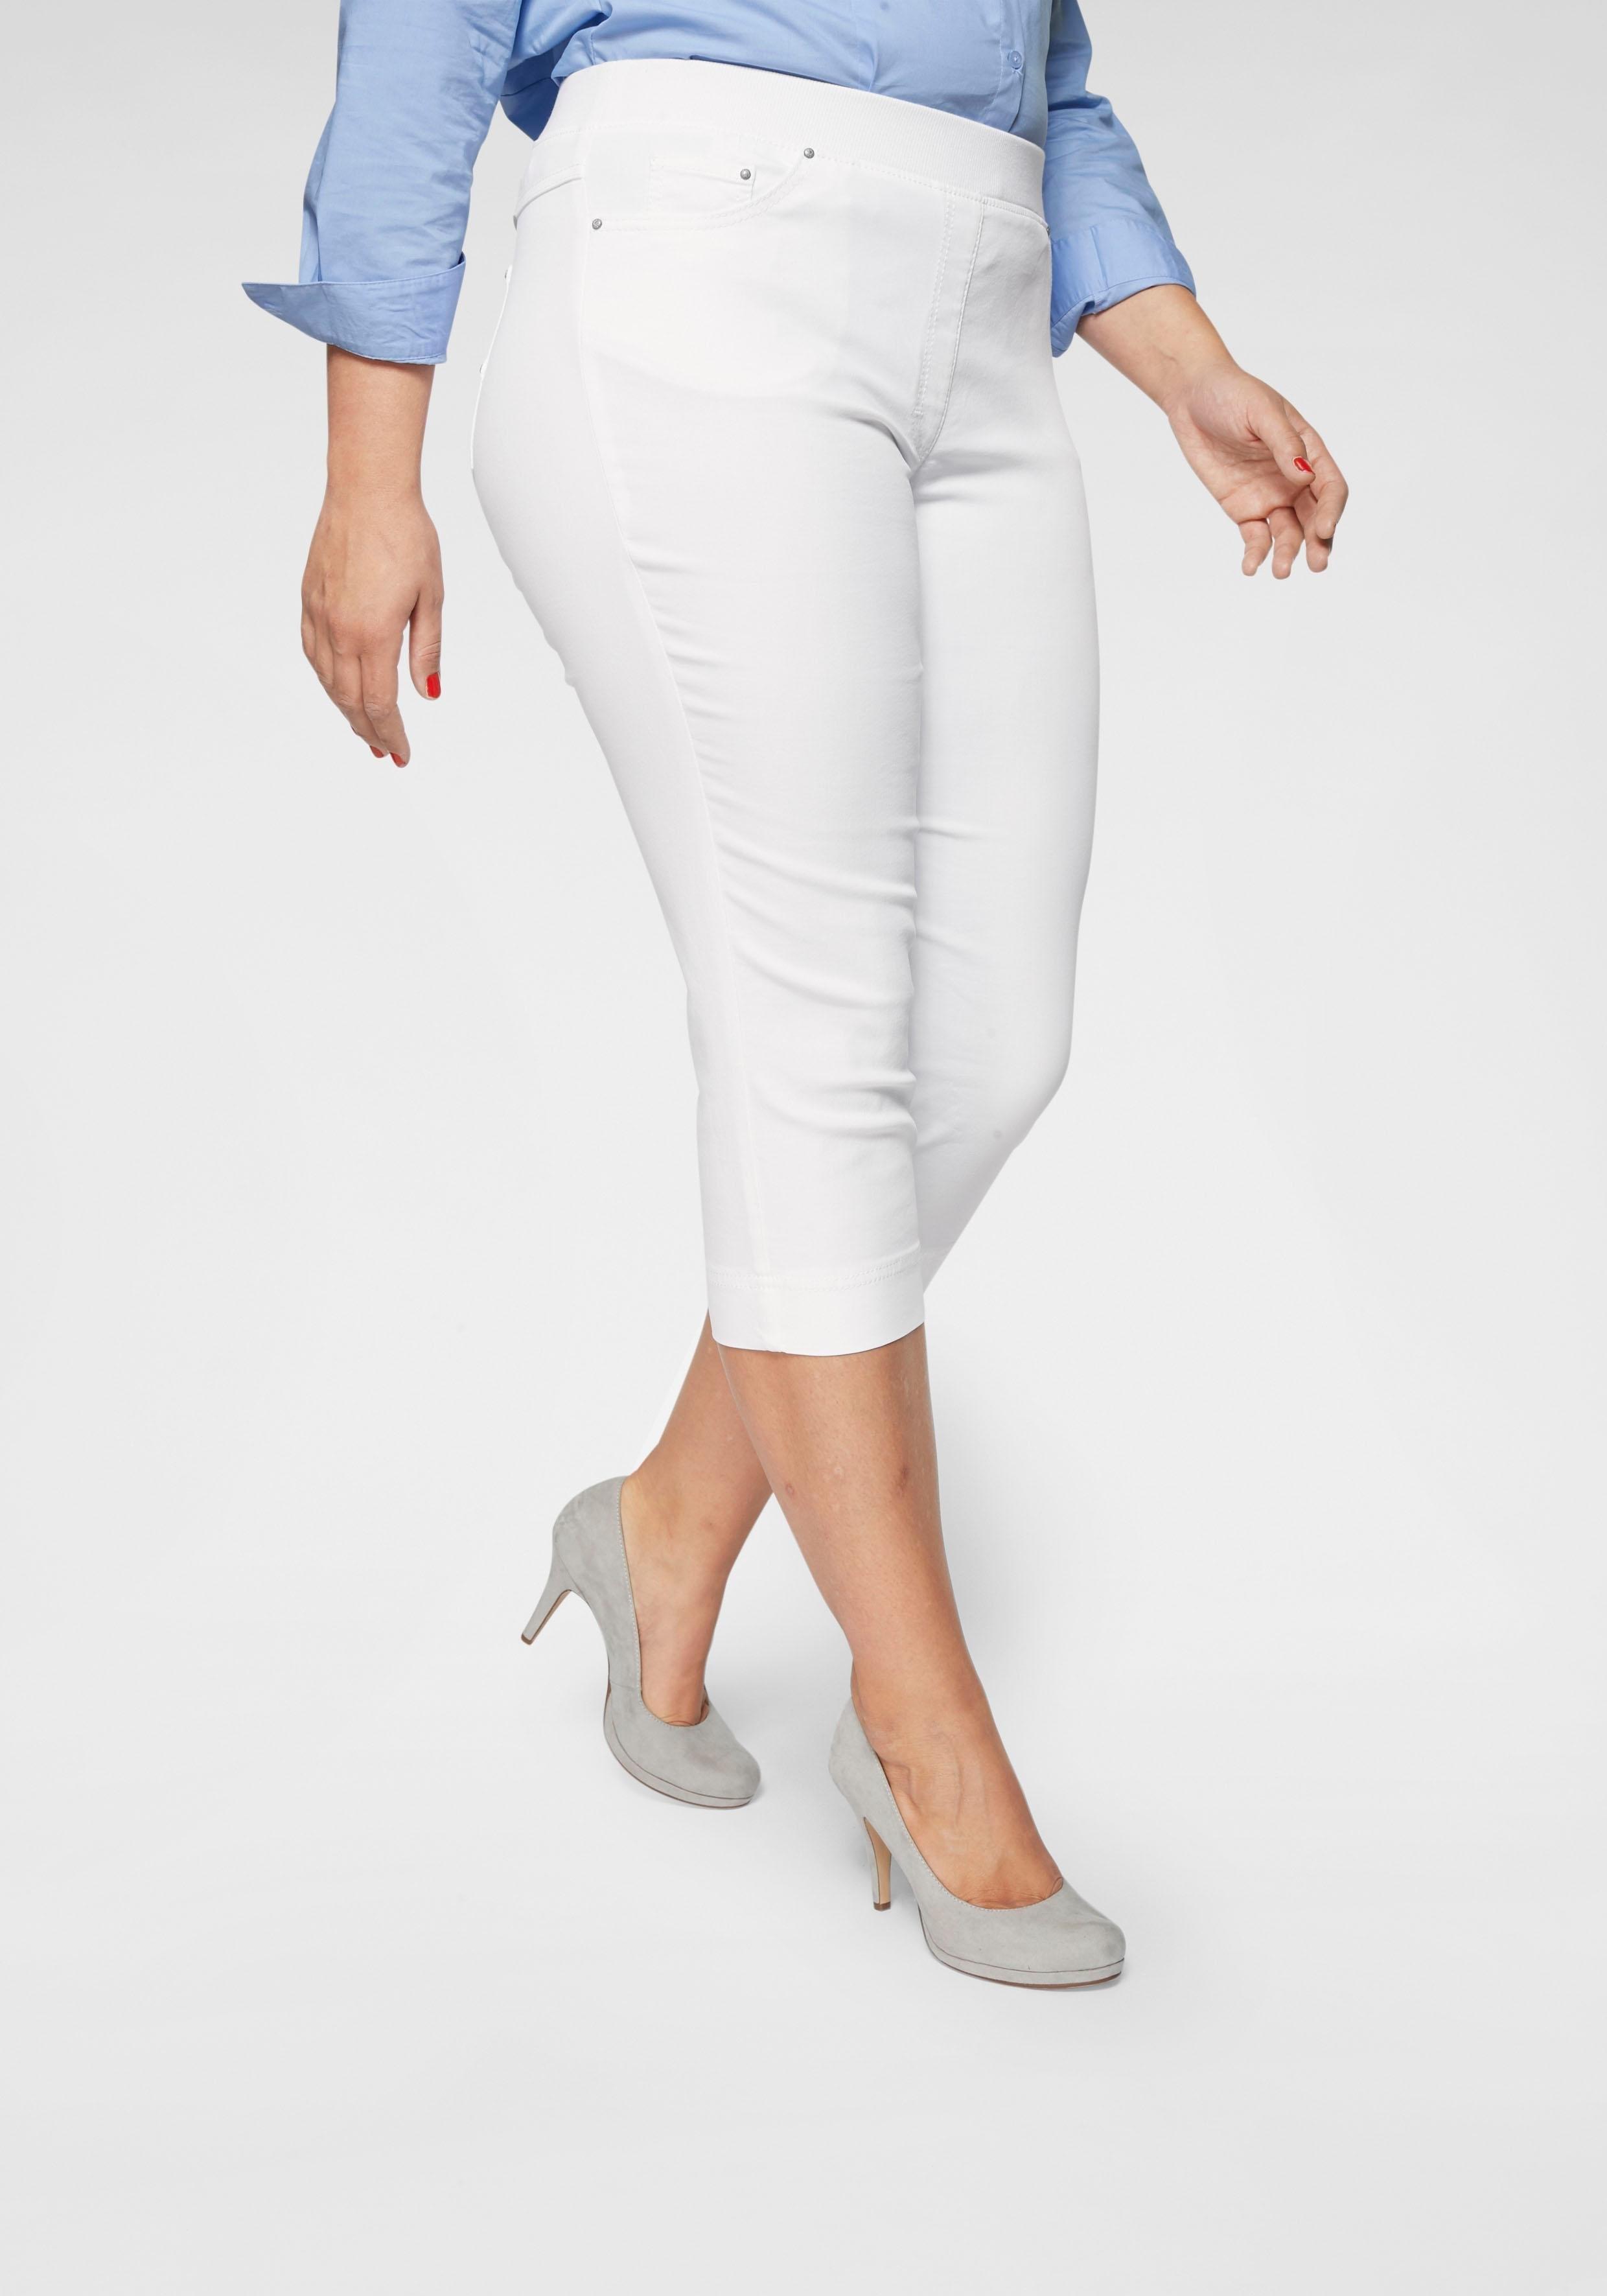 Raphaela By Brax capri jeans »Pamoma« voordelig en veilig online kopen